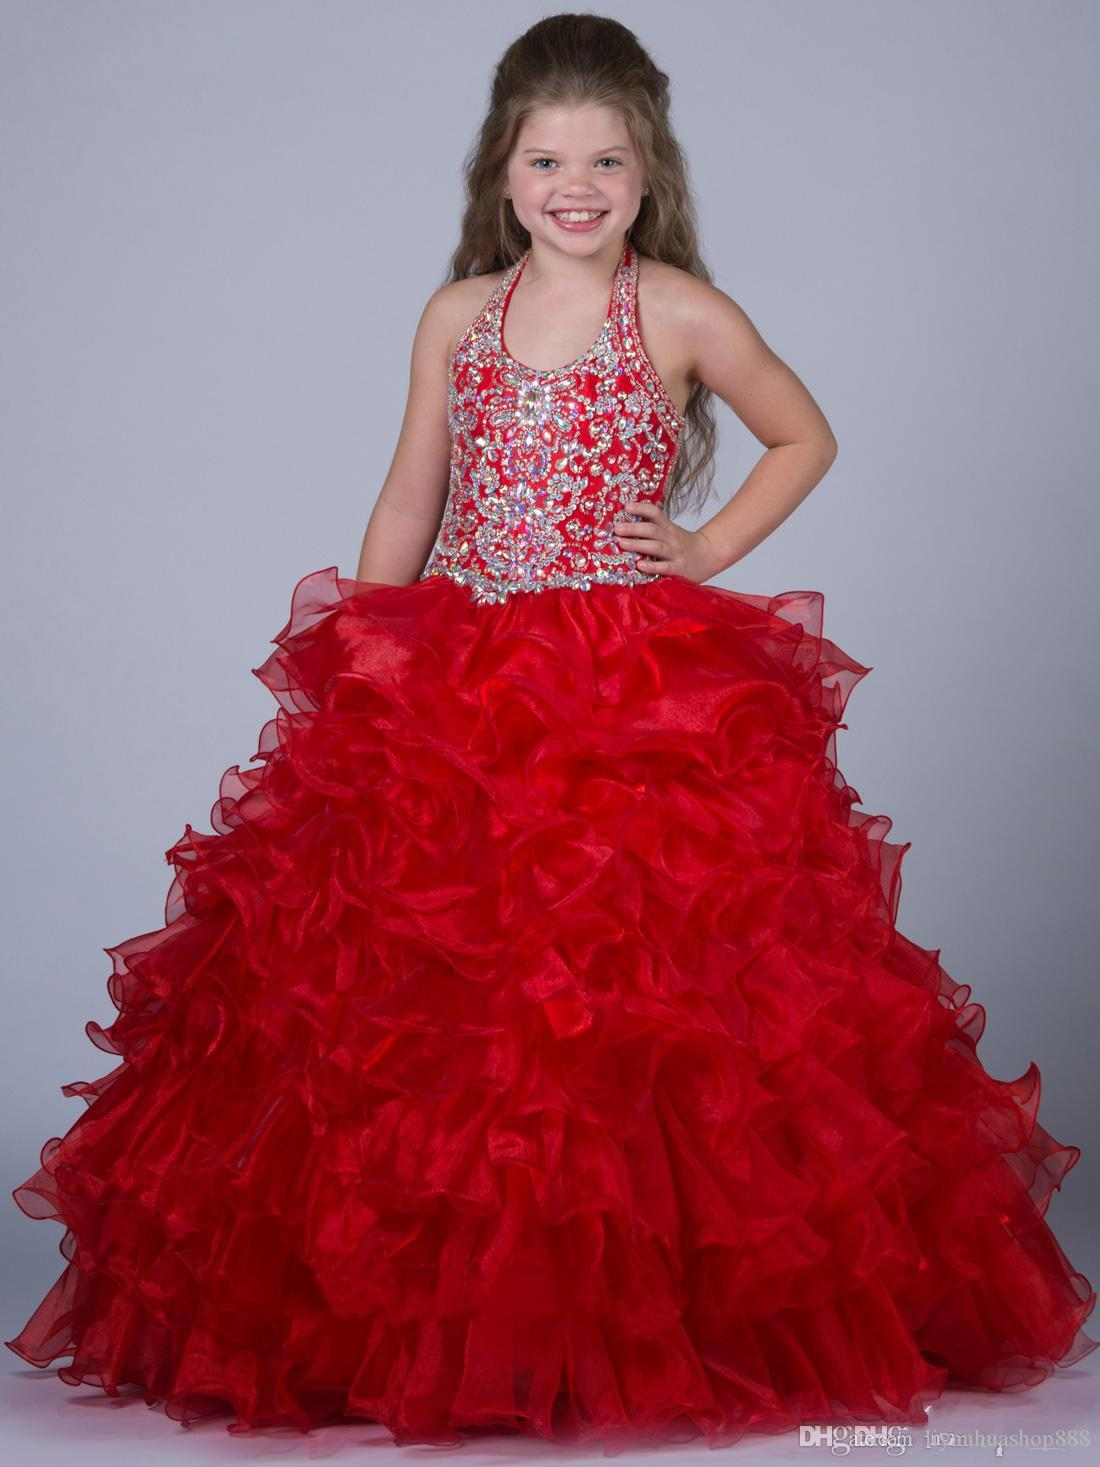 Sexy Jade Little Rosie Girls Pageant Prom Dresses Halter Backless Ball Gown Tiered Flower Girl Abiti da sposa Junior Bridesmiad